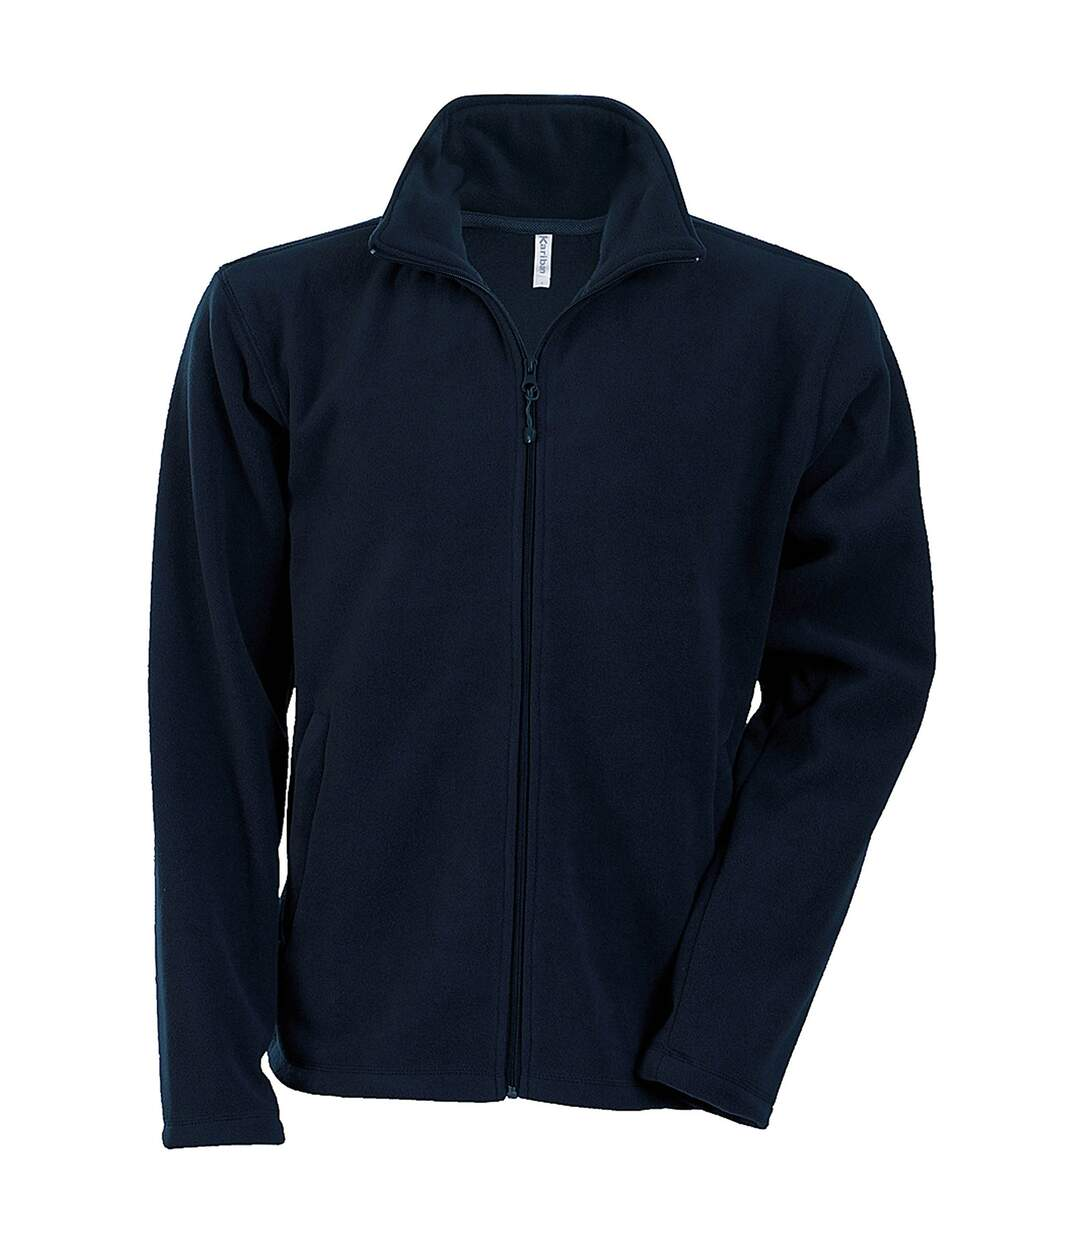 Kariban Mens Falco Full Zip Anti Pill Fleece Jacket (Dark Grey) - UTRW737